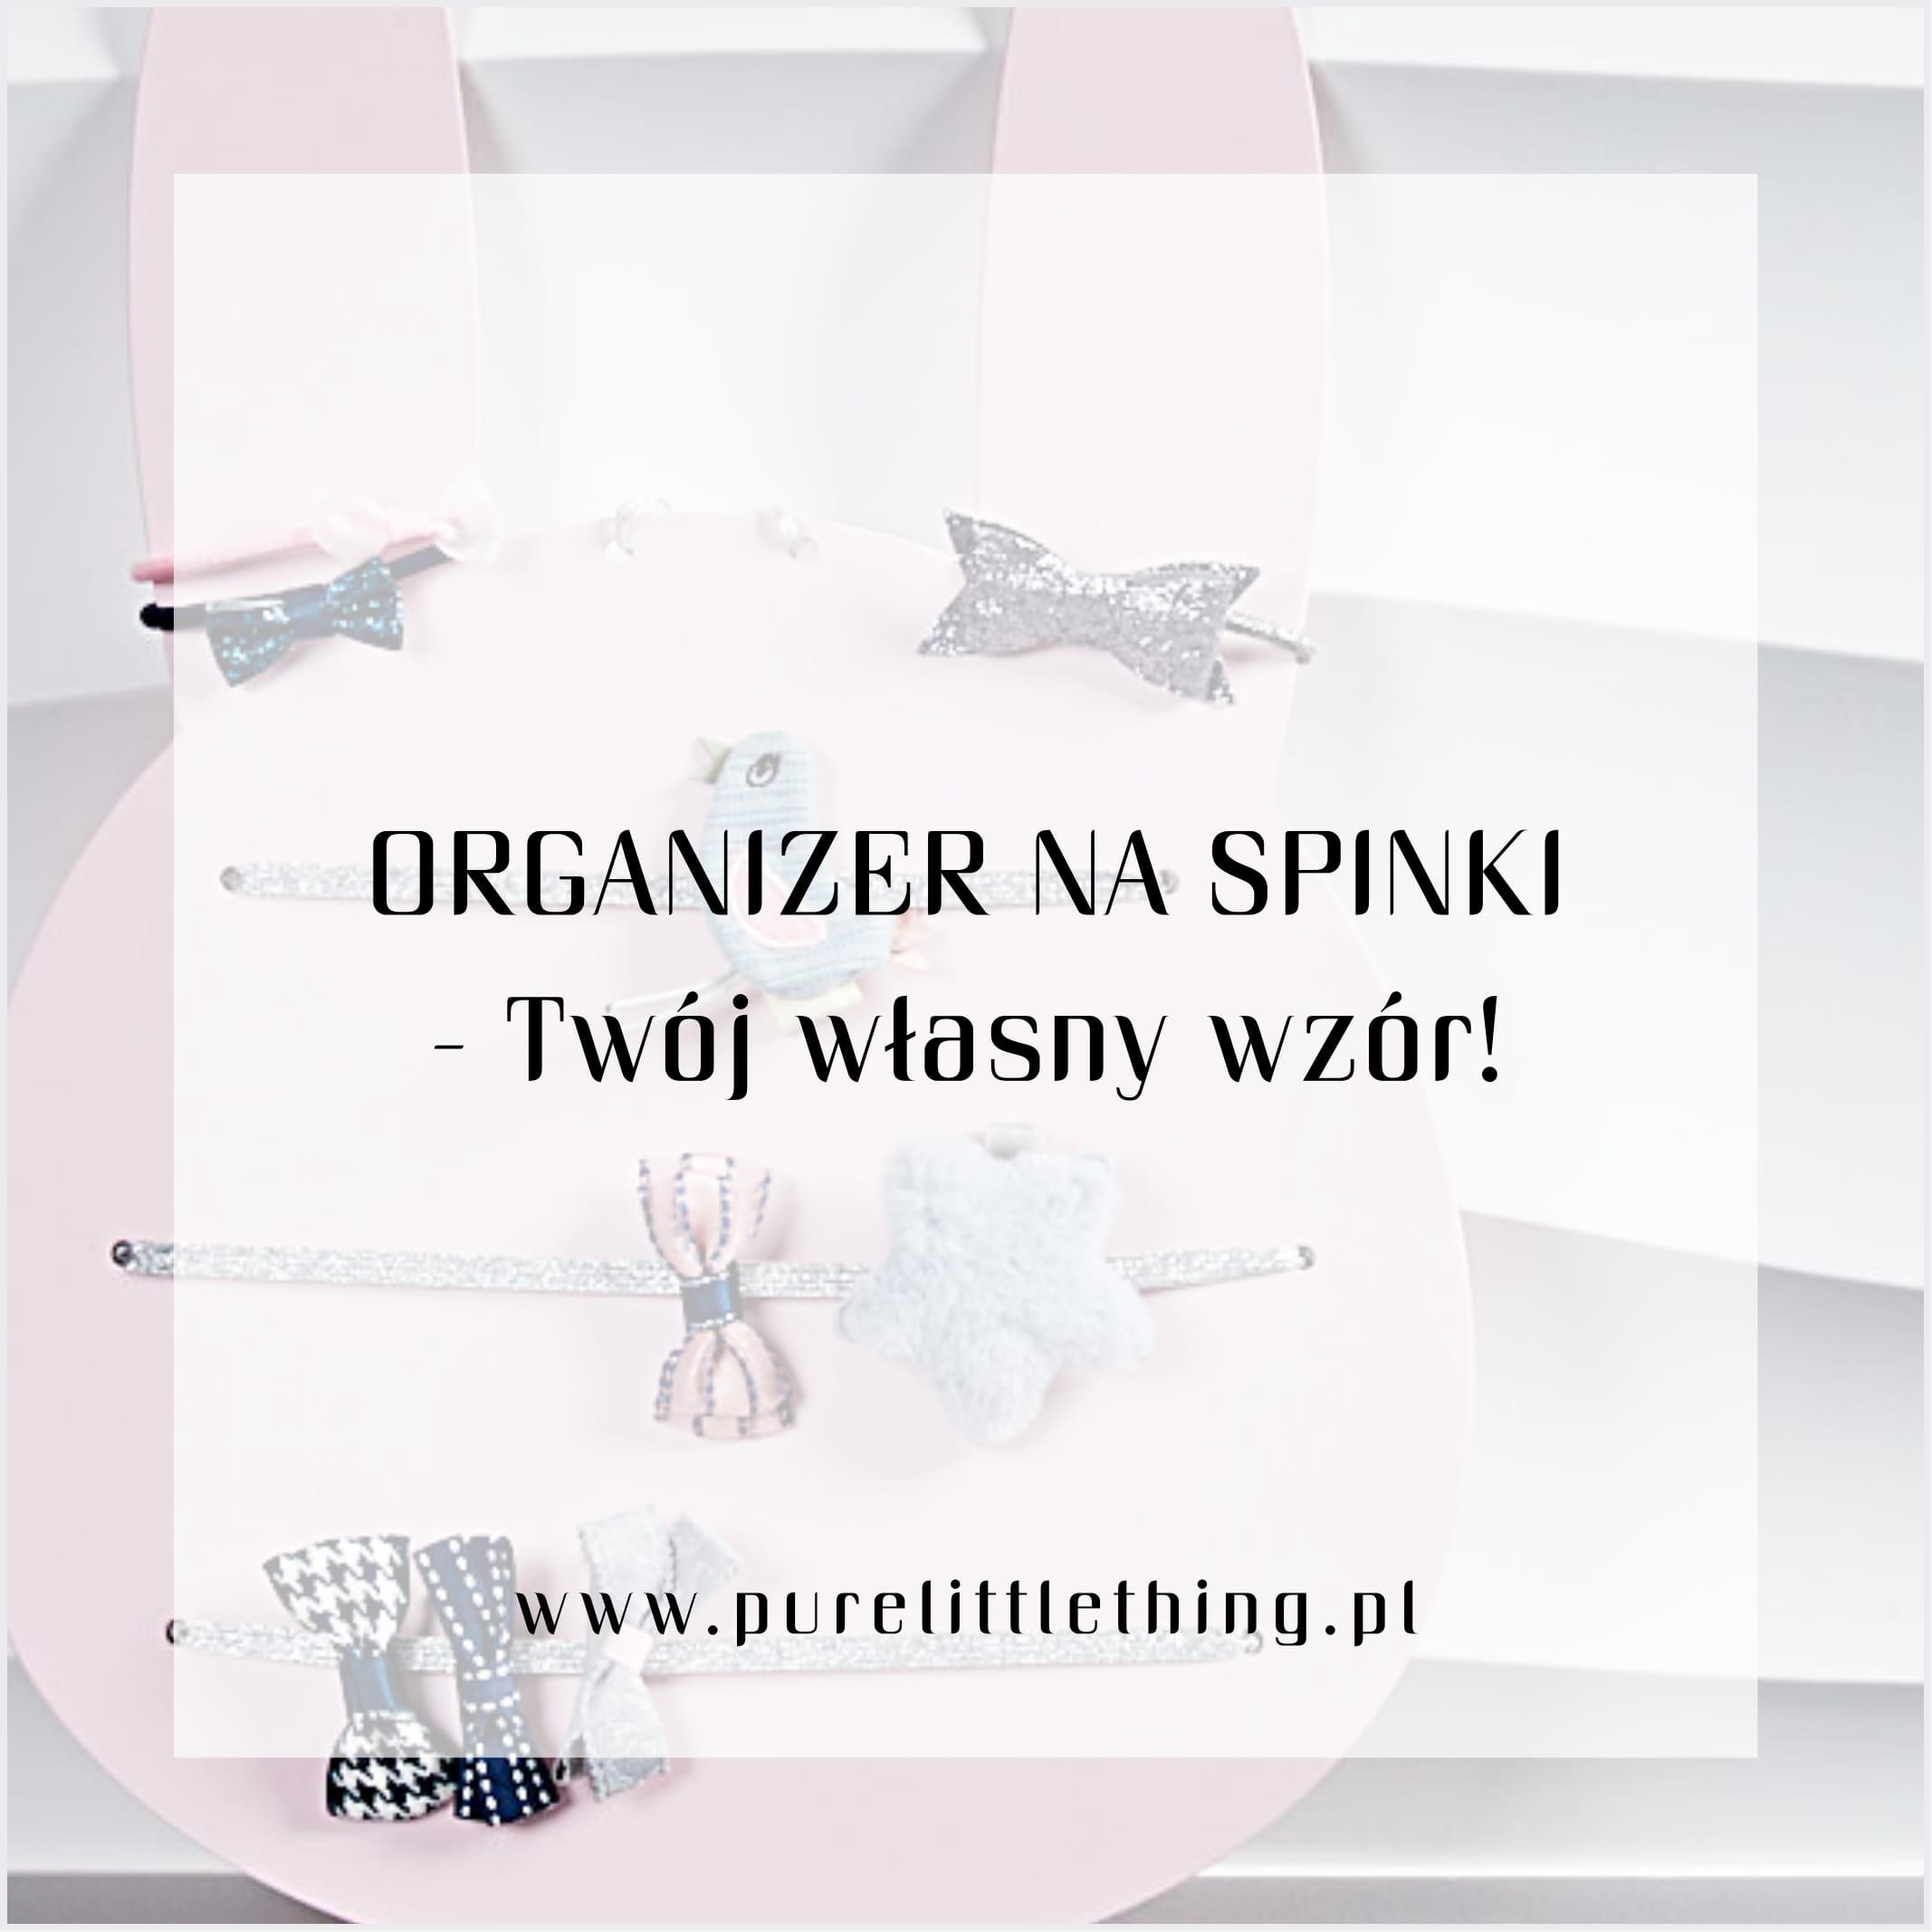 promocja_organizer_spinki-1